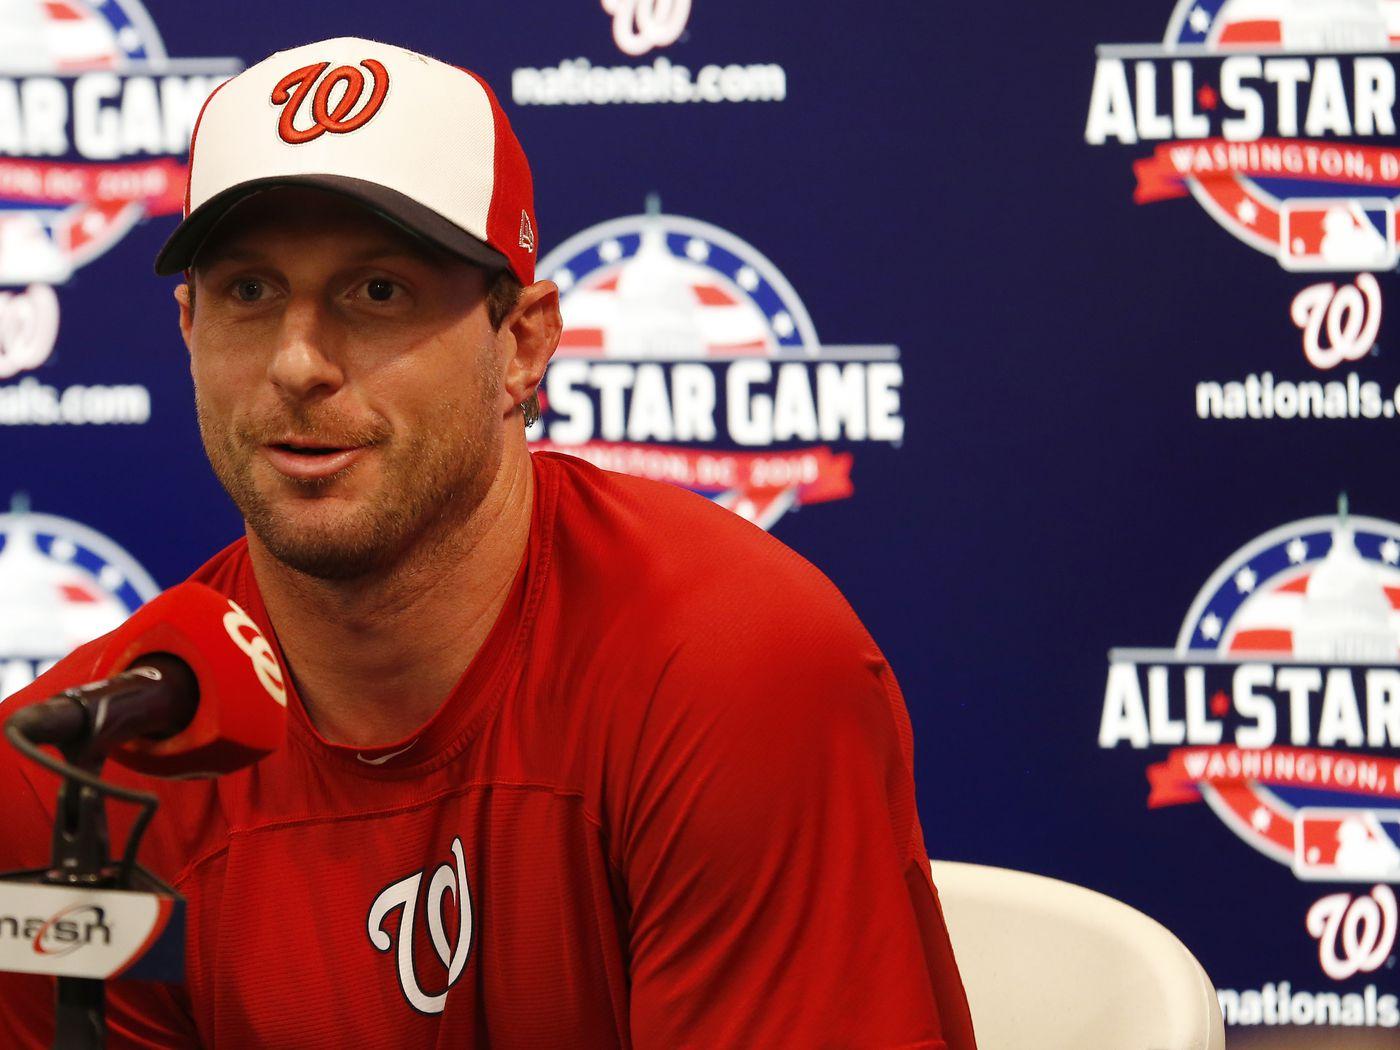 3a6aae26110 MLB All-Star Weekend 2018  Dates